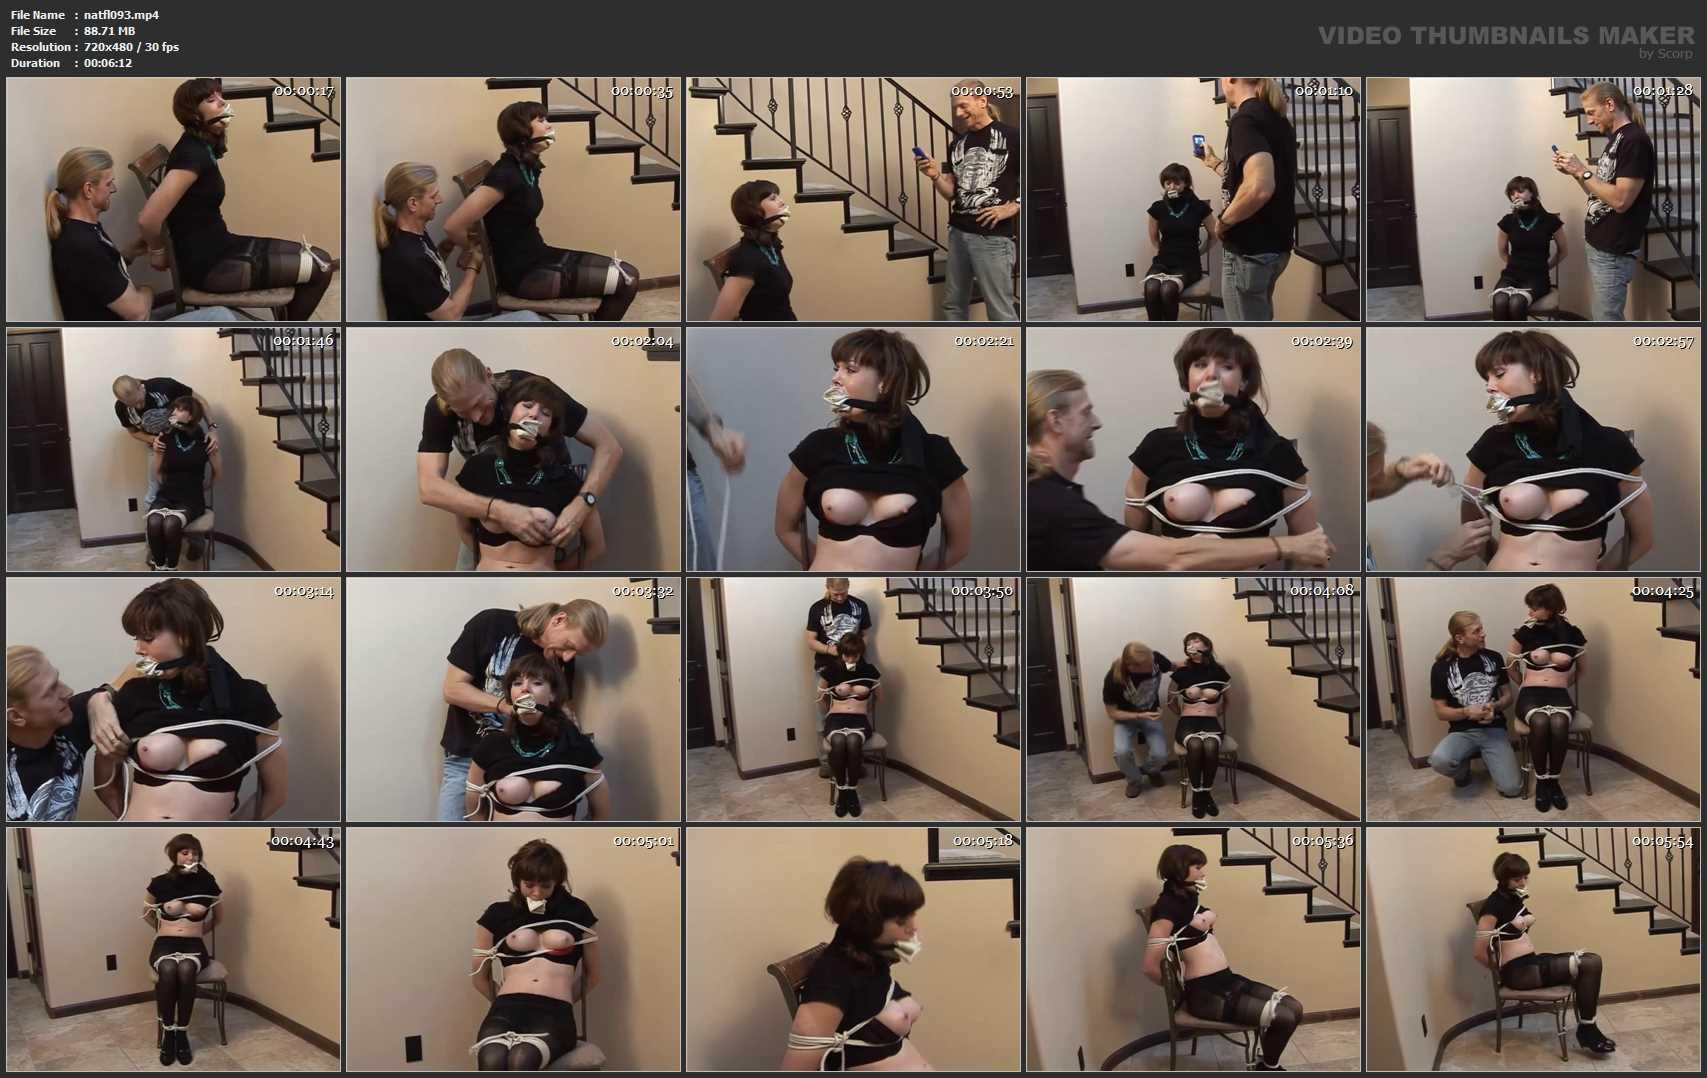 [DAMSEL STYLE BONDAGE & BONDAGE SEX VIDEOS] Sexy Blonde Chloe Held Ransom in Miniskirt & Thigh-High Stockings. Featuring: Chloe Night [SD][480p][MP4]